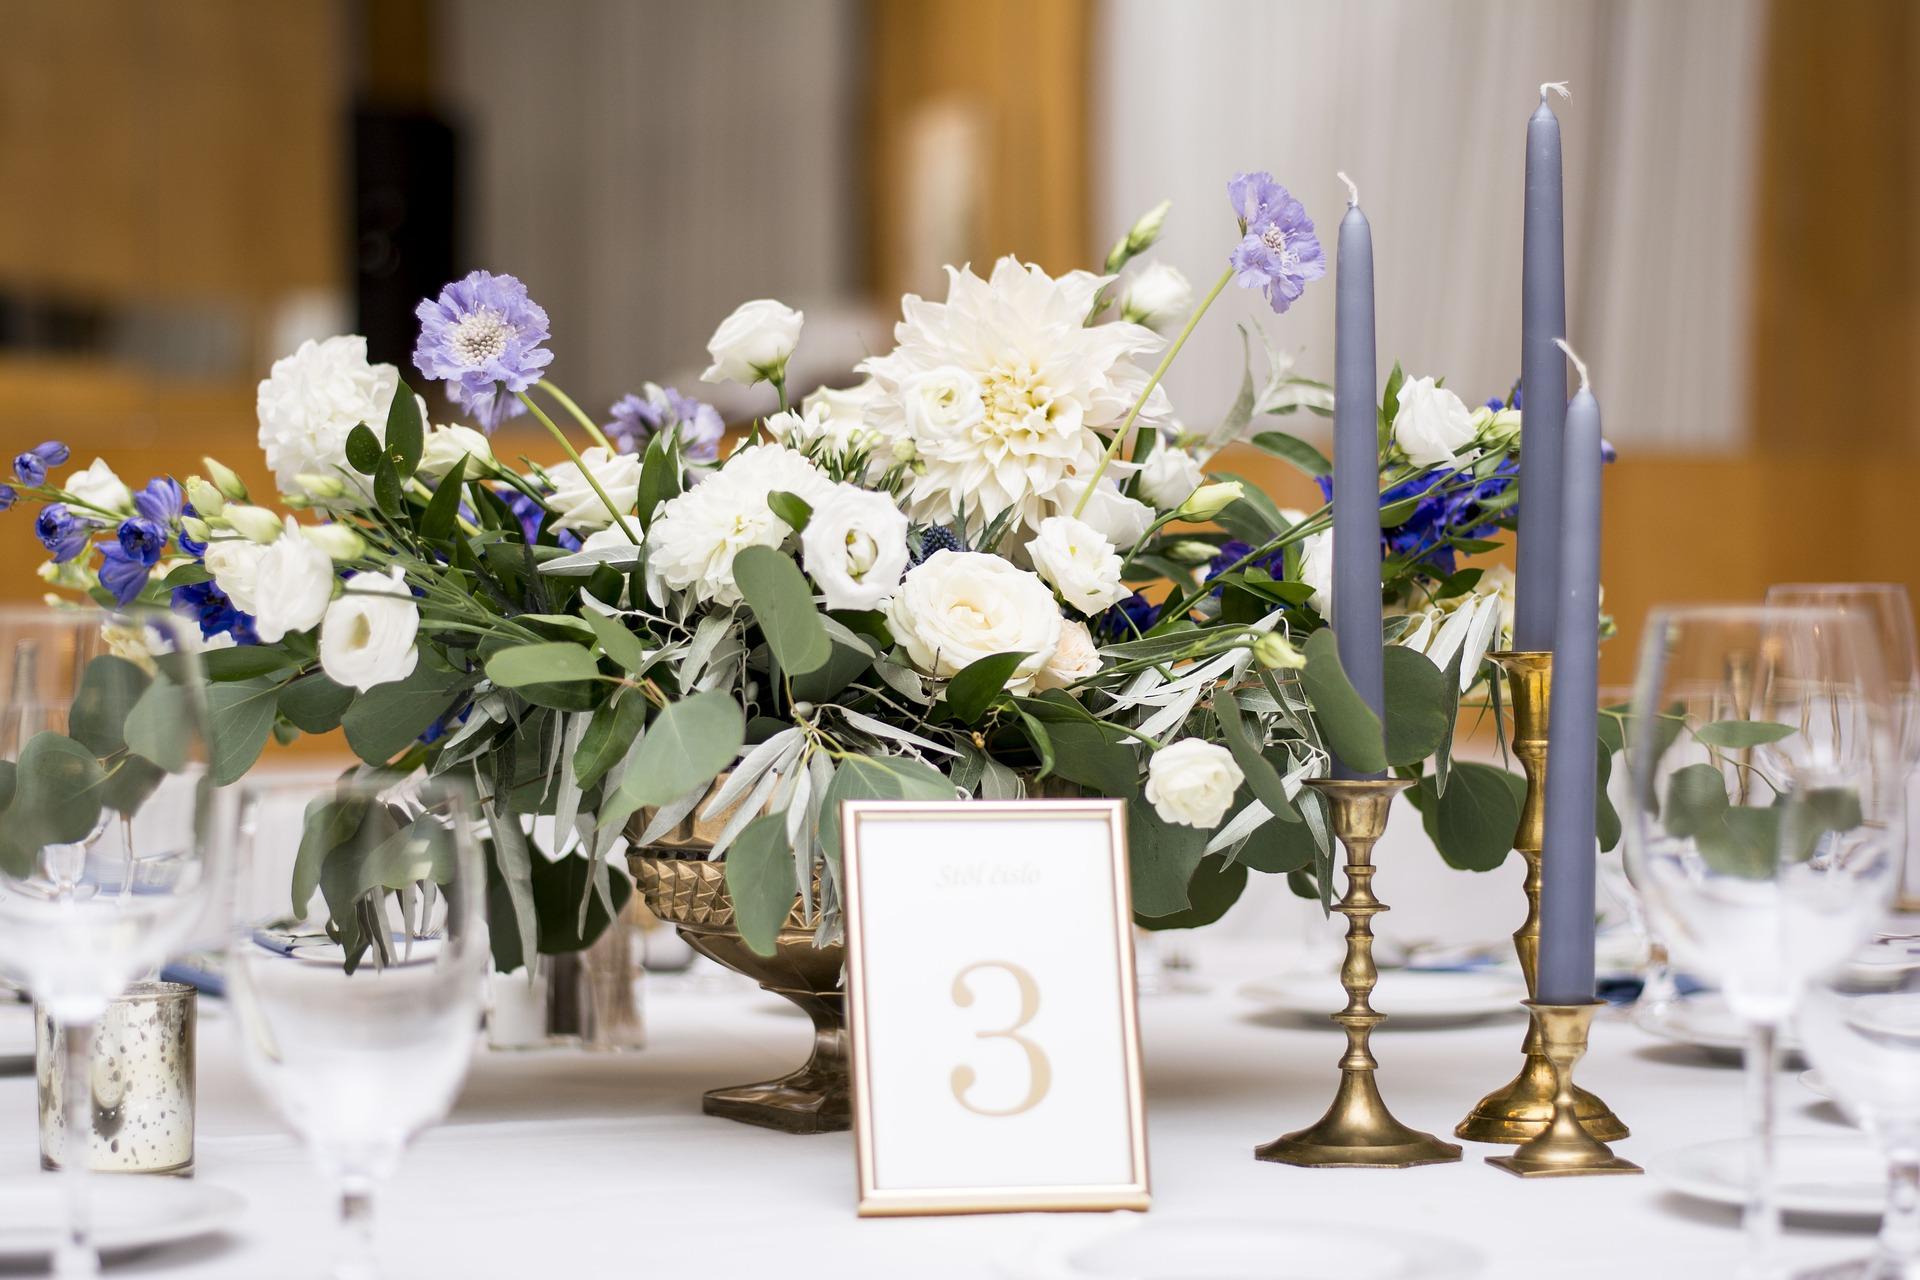 Lieu de réception mariage Montpellier, Perpignan, Béziers